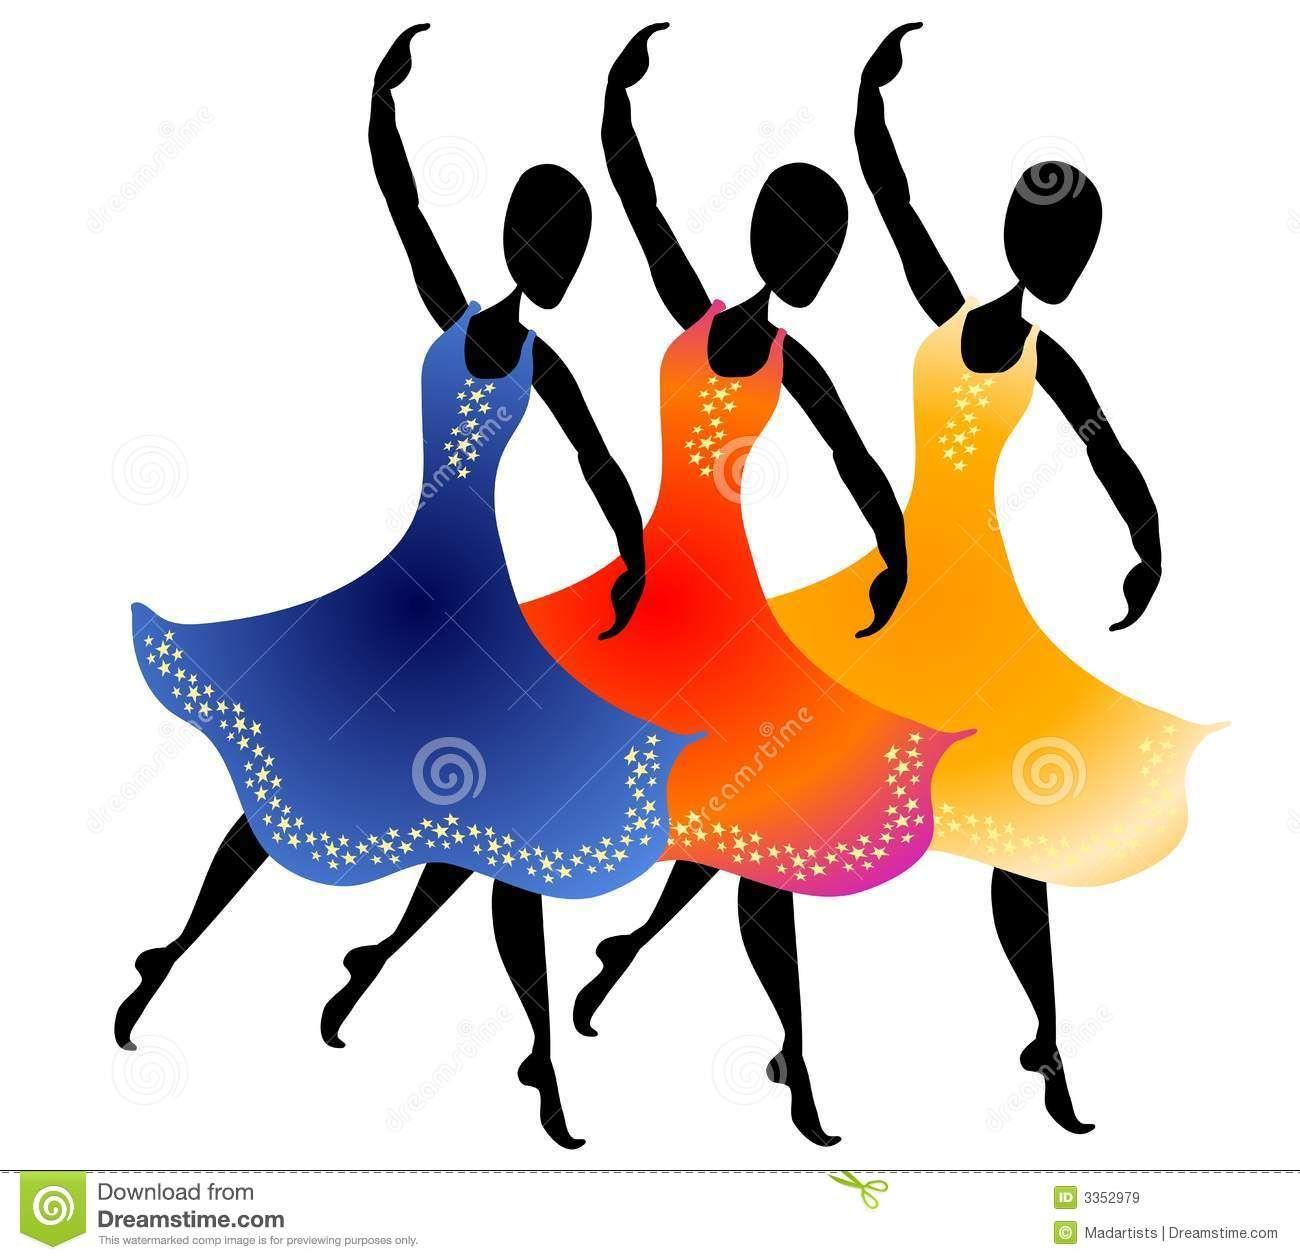 3 Women Dancing Clip Art Royalty Free Stock Images.